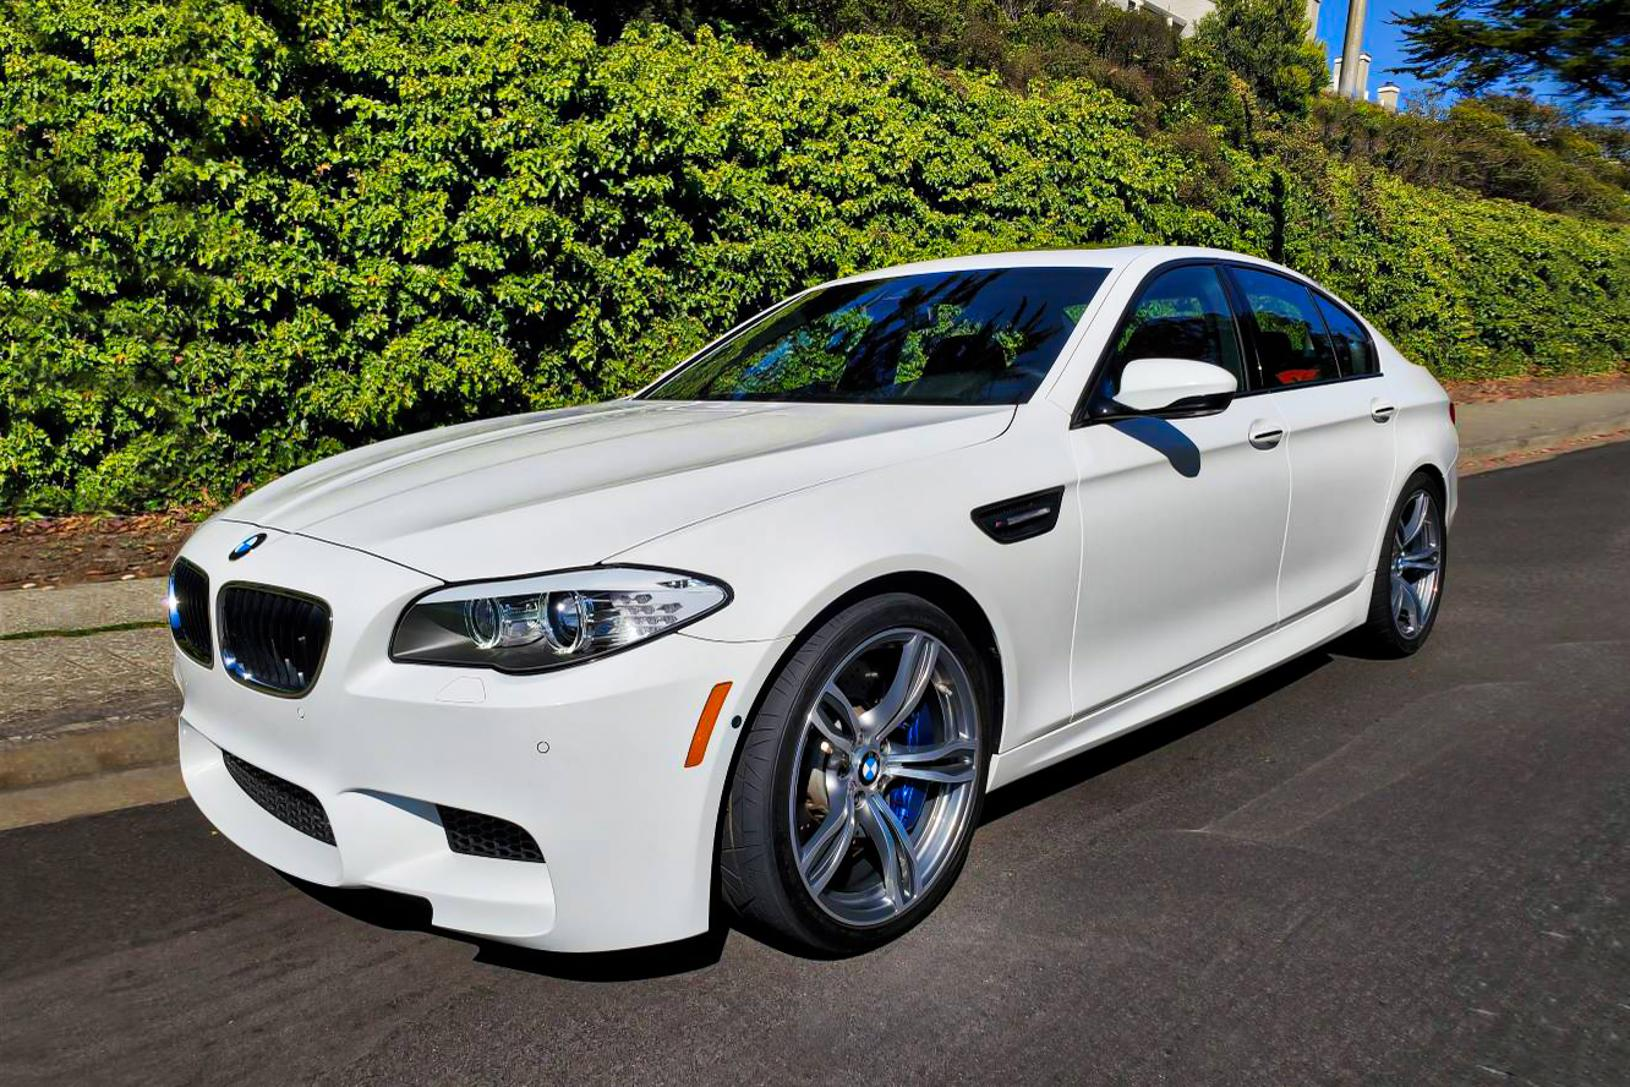 2013 BMW M5 'Dinan'